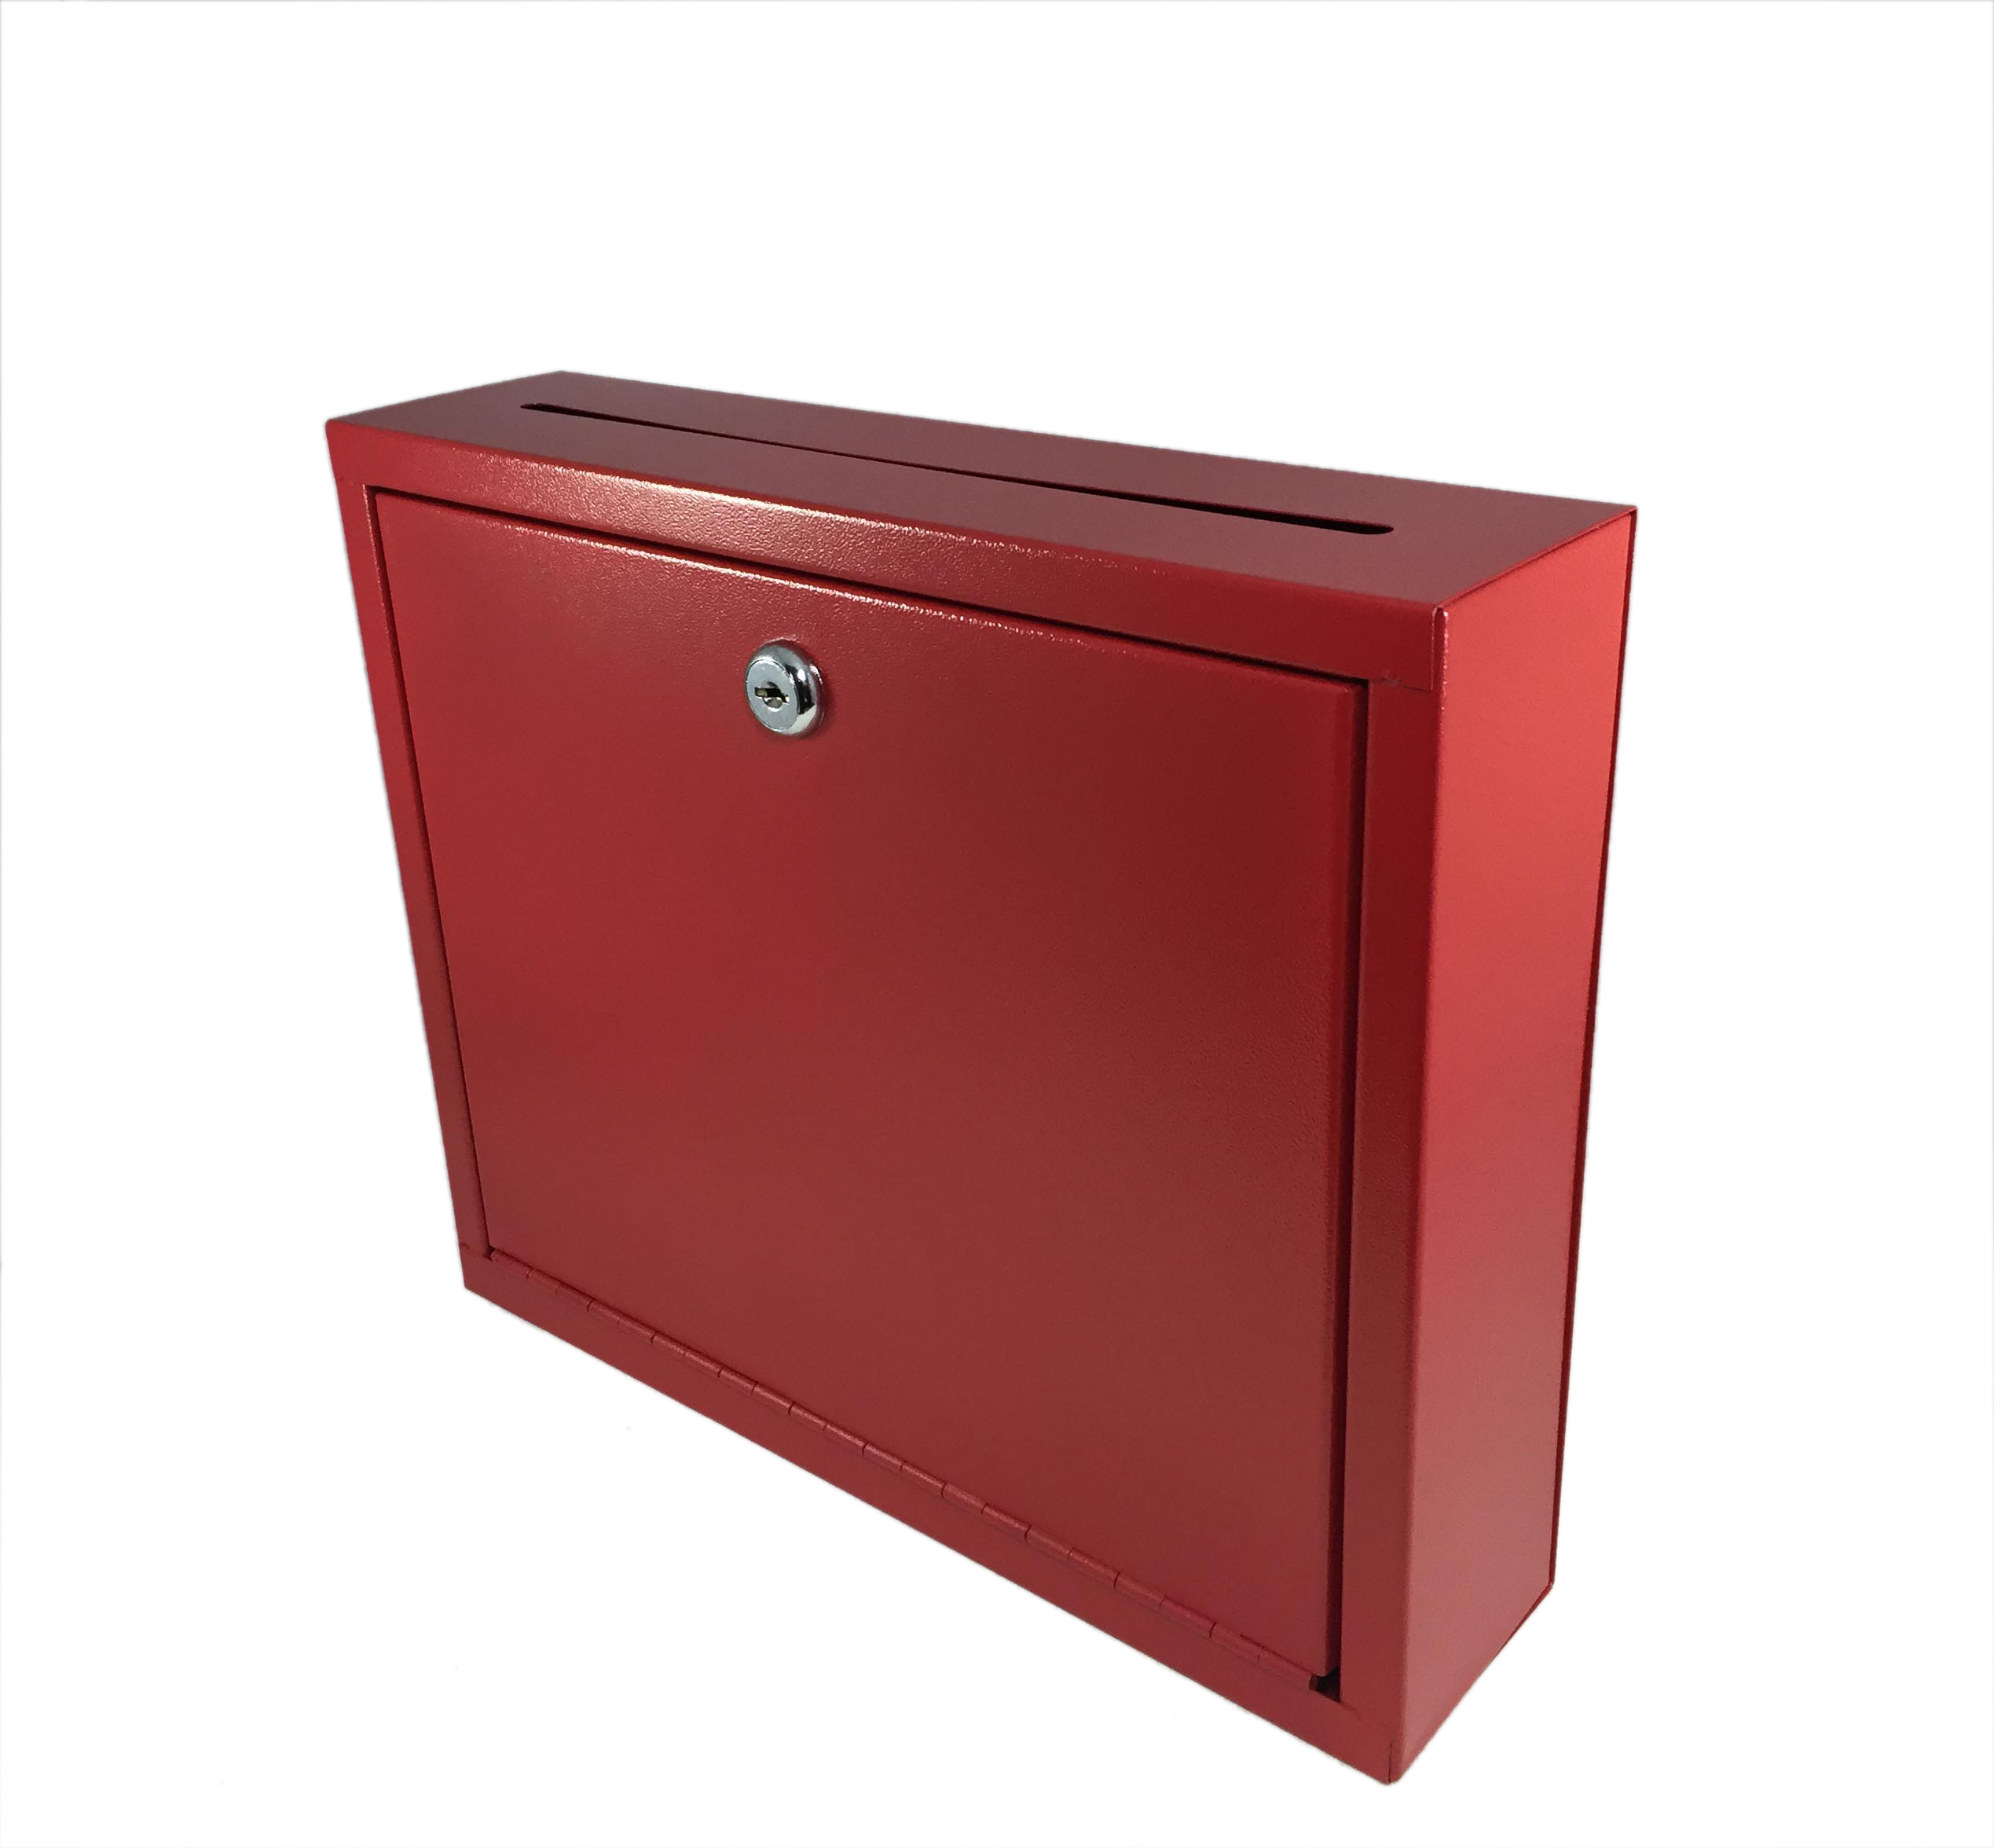 Saw Wall Mount Box : Wall mount counter suggestion box donation drop